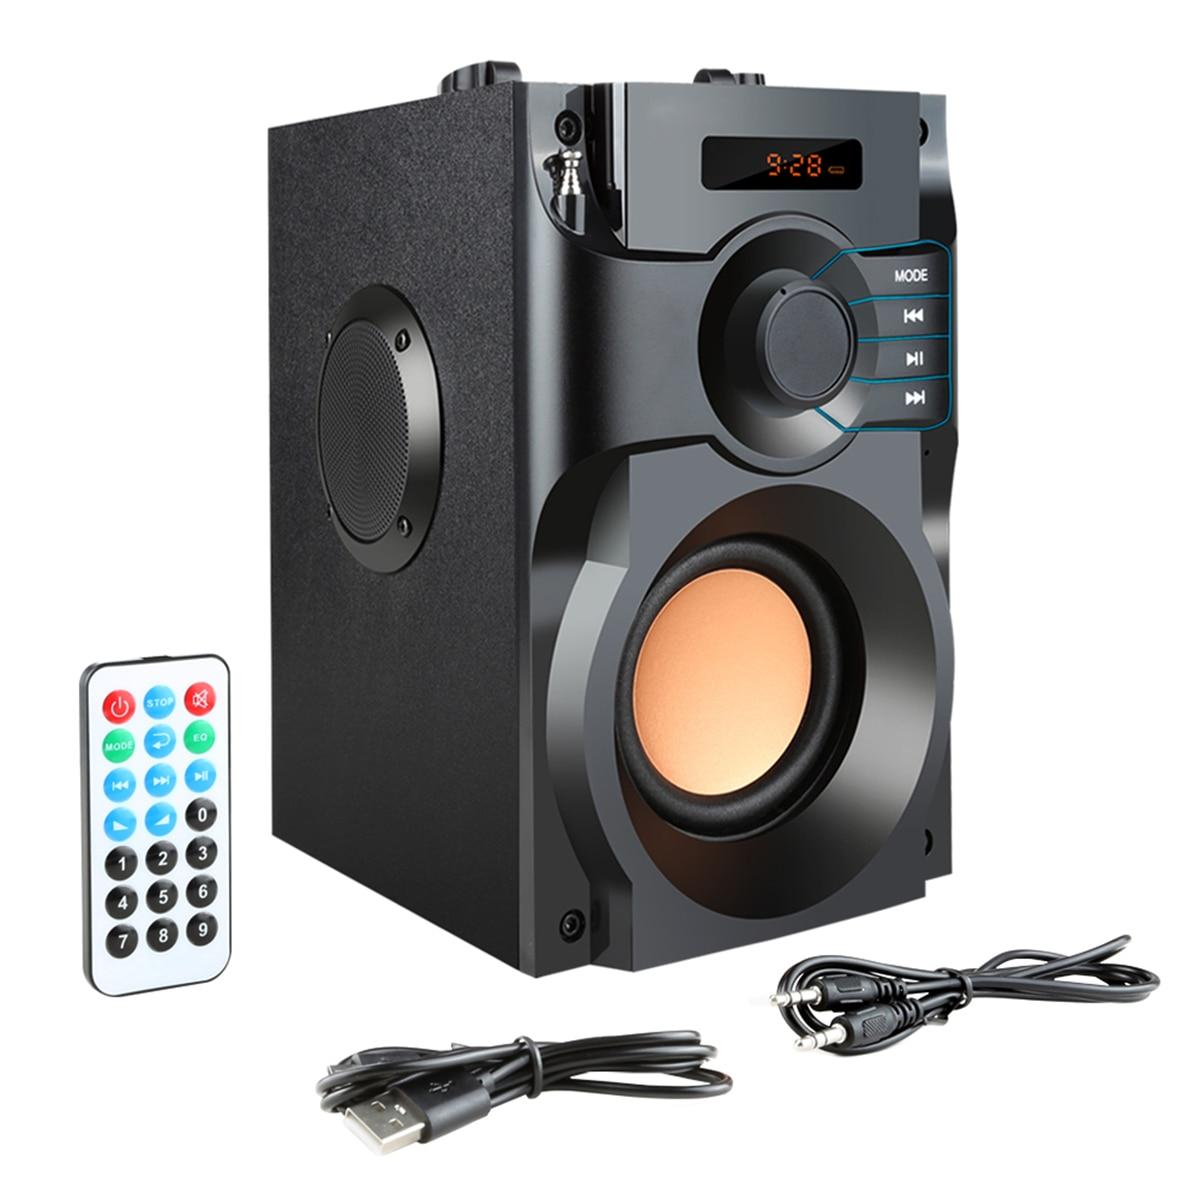 Outdoor Bluetooth Speaker Stereo Wireless Box Sound Bluetooth Subwoofer Soundbar Box FM TF AUX + Remote Control Speaker cute rabbit 3w bluetooth 2 1 ch speaker w tf remote control white pink